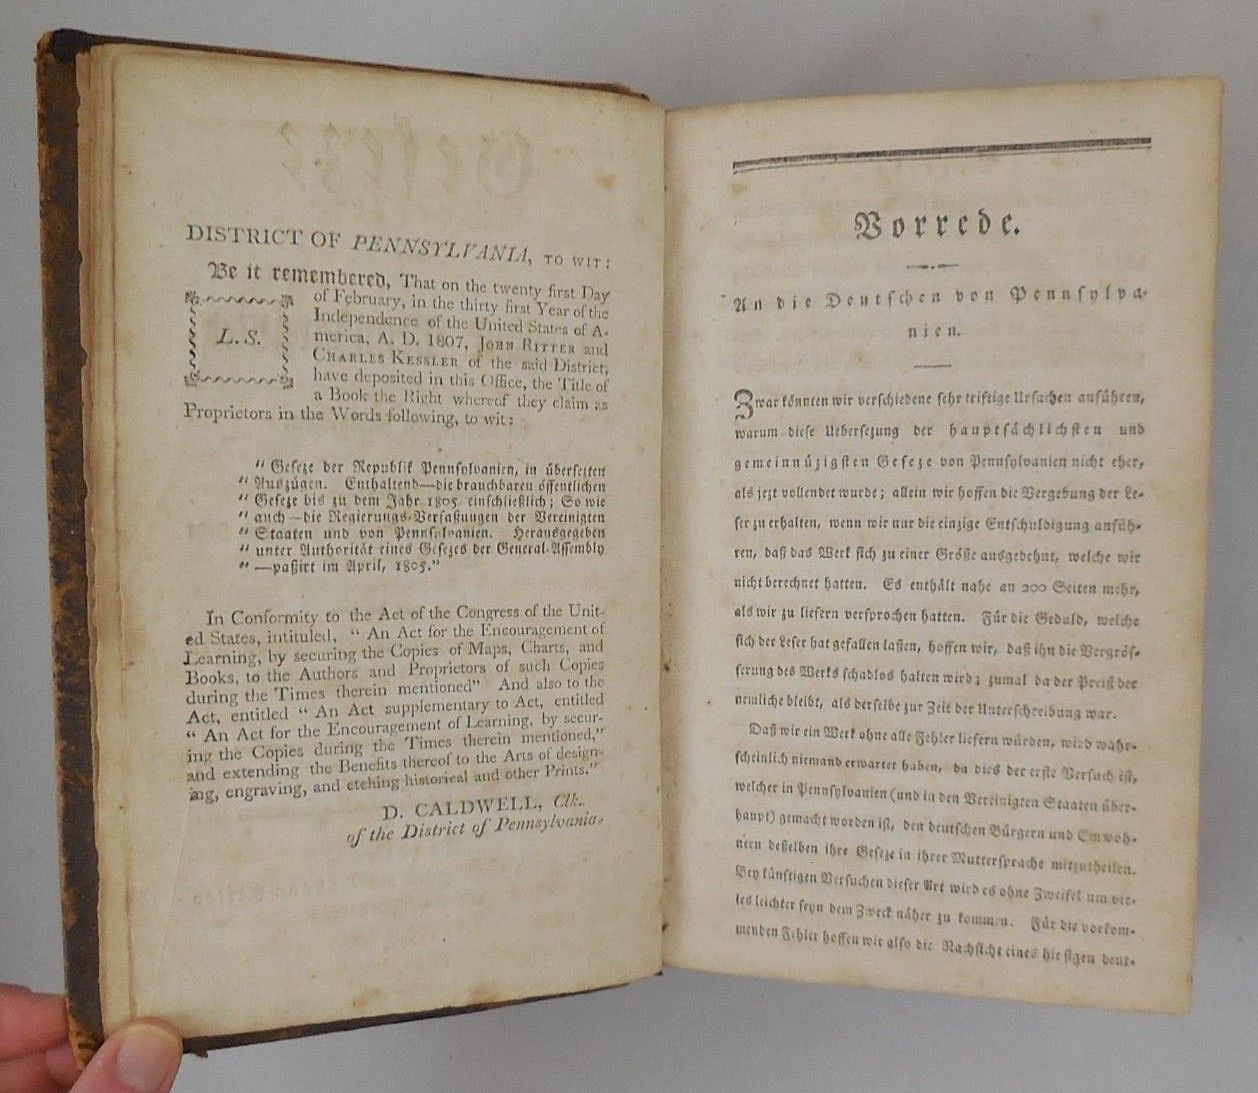 GESEZE DER REPUBLIK PENNSYLVANIEN - 1807 [German]